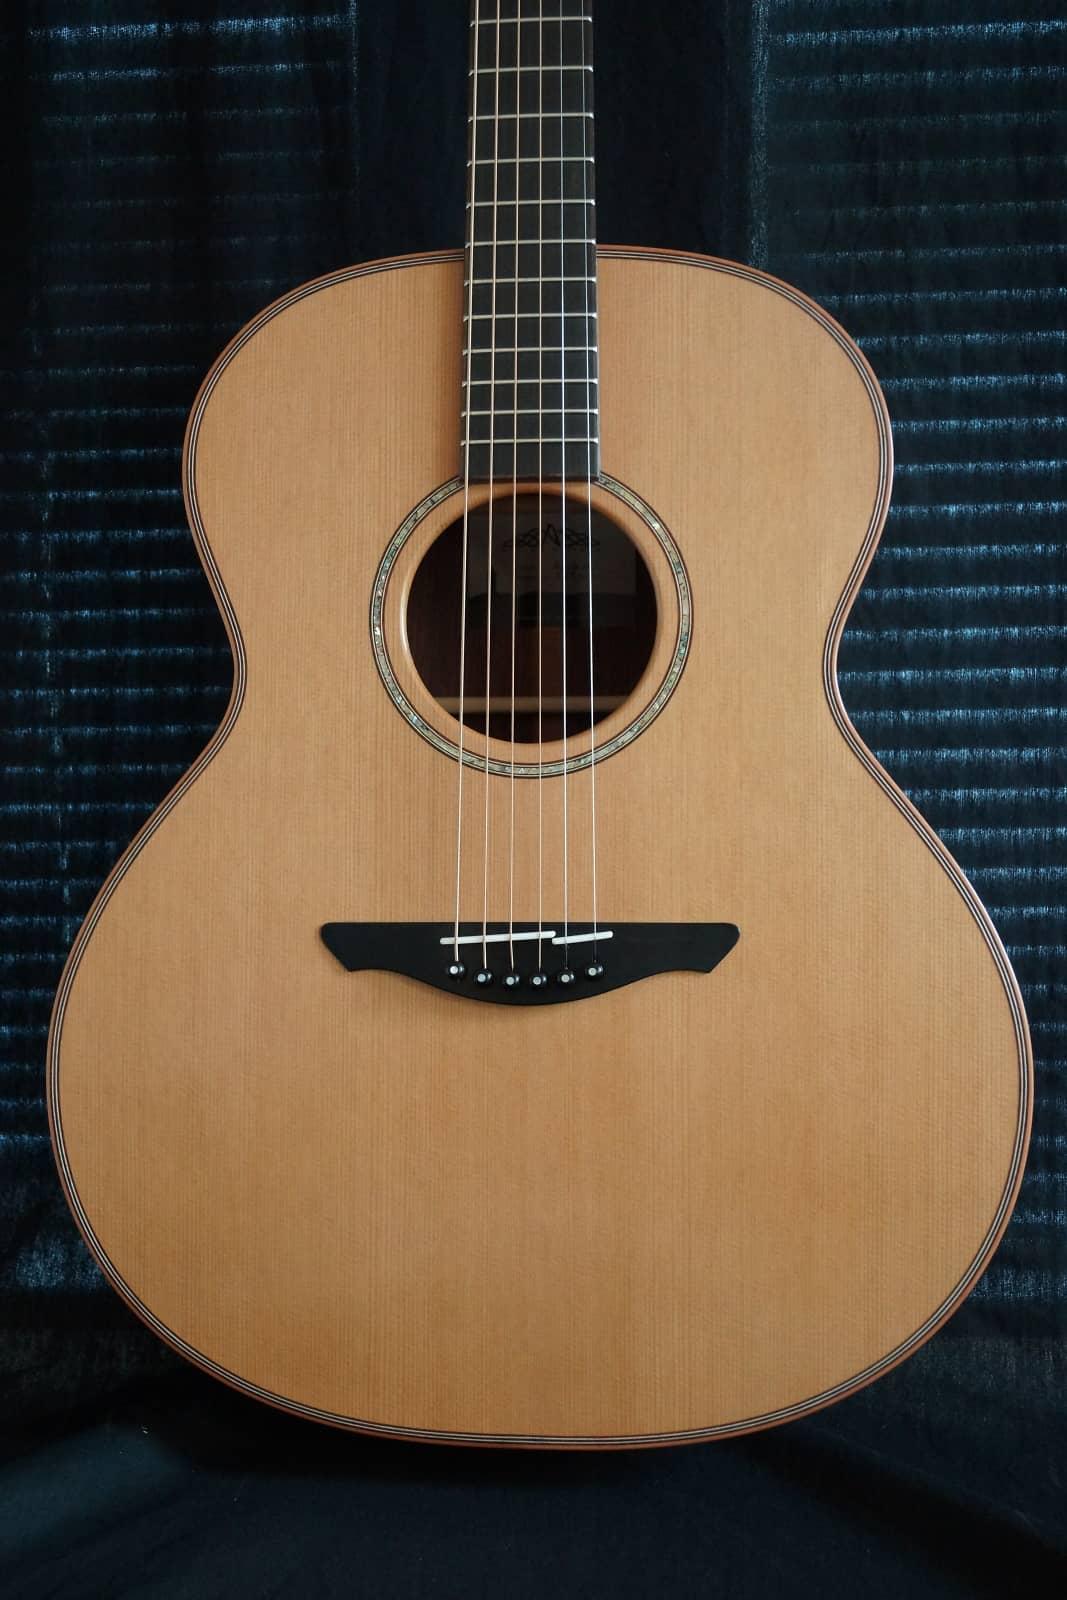 brand new waranteed avalon a1 20 cedar top acoustic guitar reverb. Black Bedroom Furniture Sets. Home Design Ideas